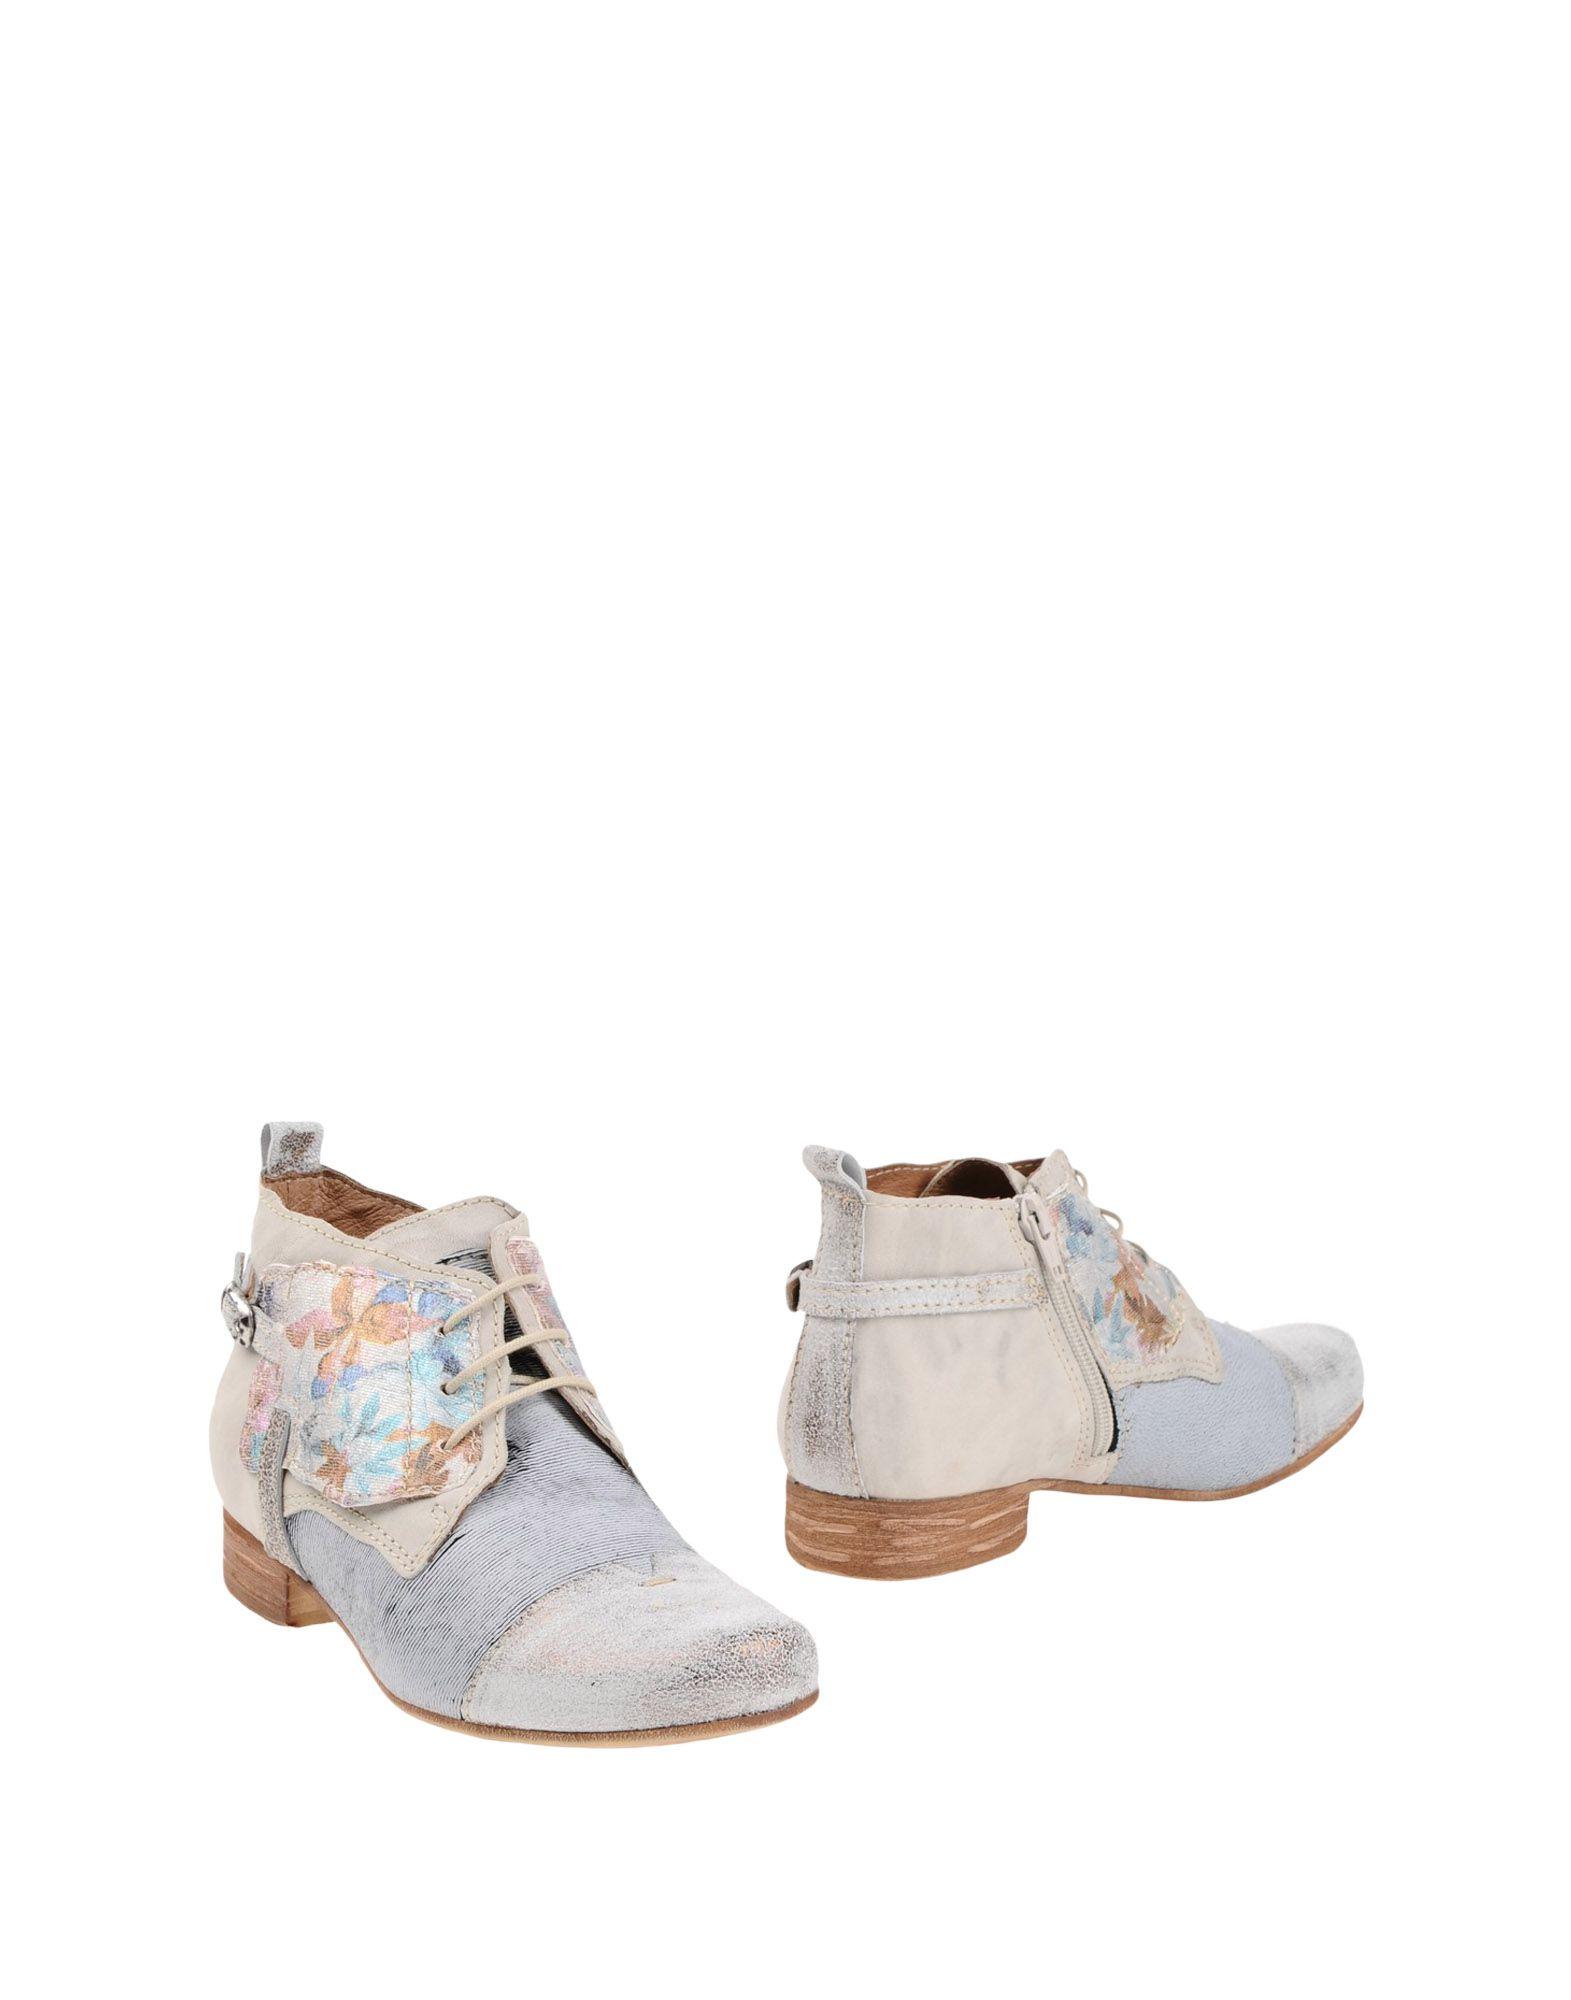 CLOCHARME Полусапоги и высокие ботинки clocharme полусапоги и высокие ботинки